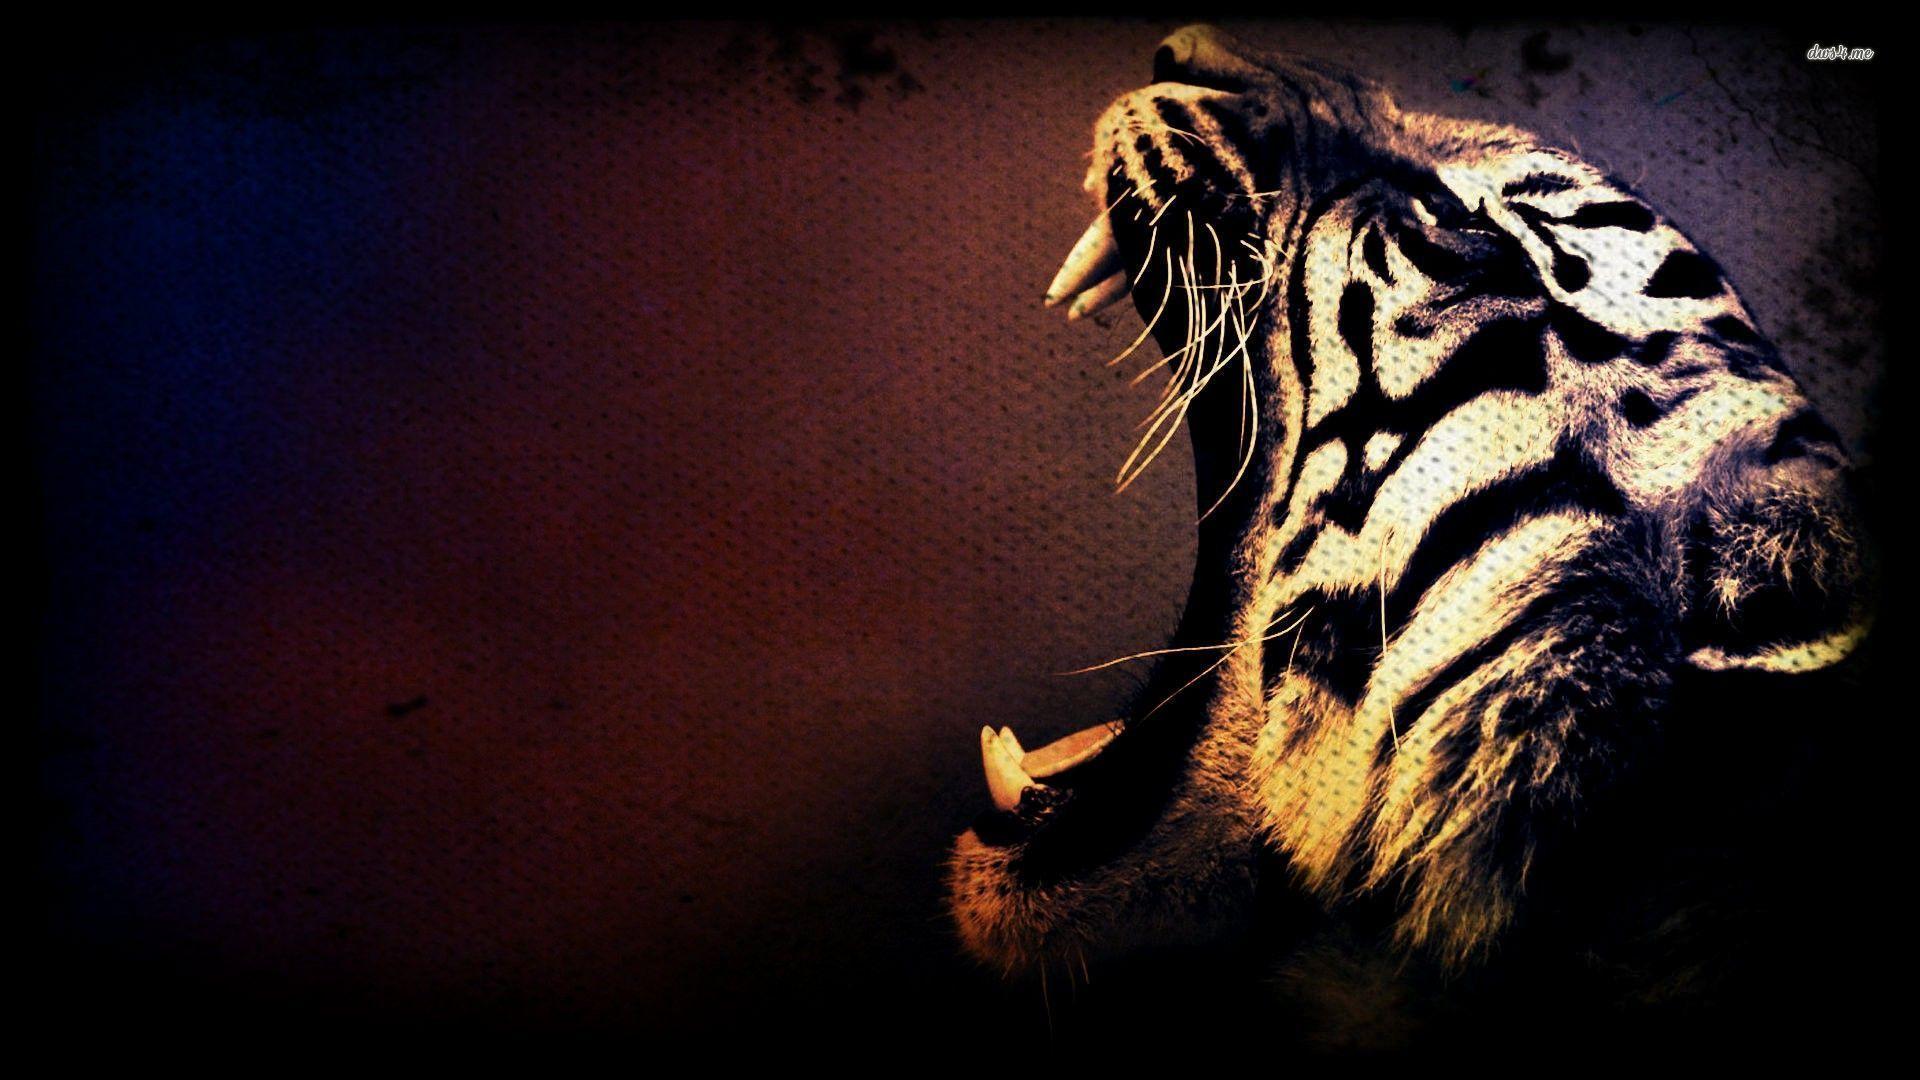 Tiger Wallpaper Hd on